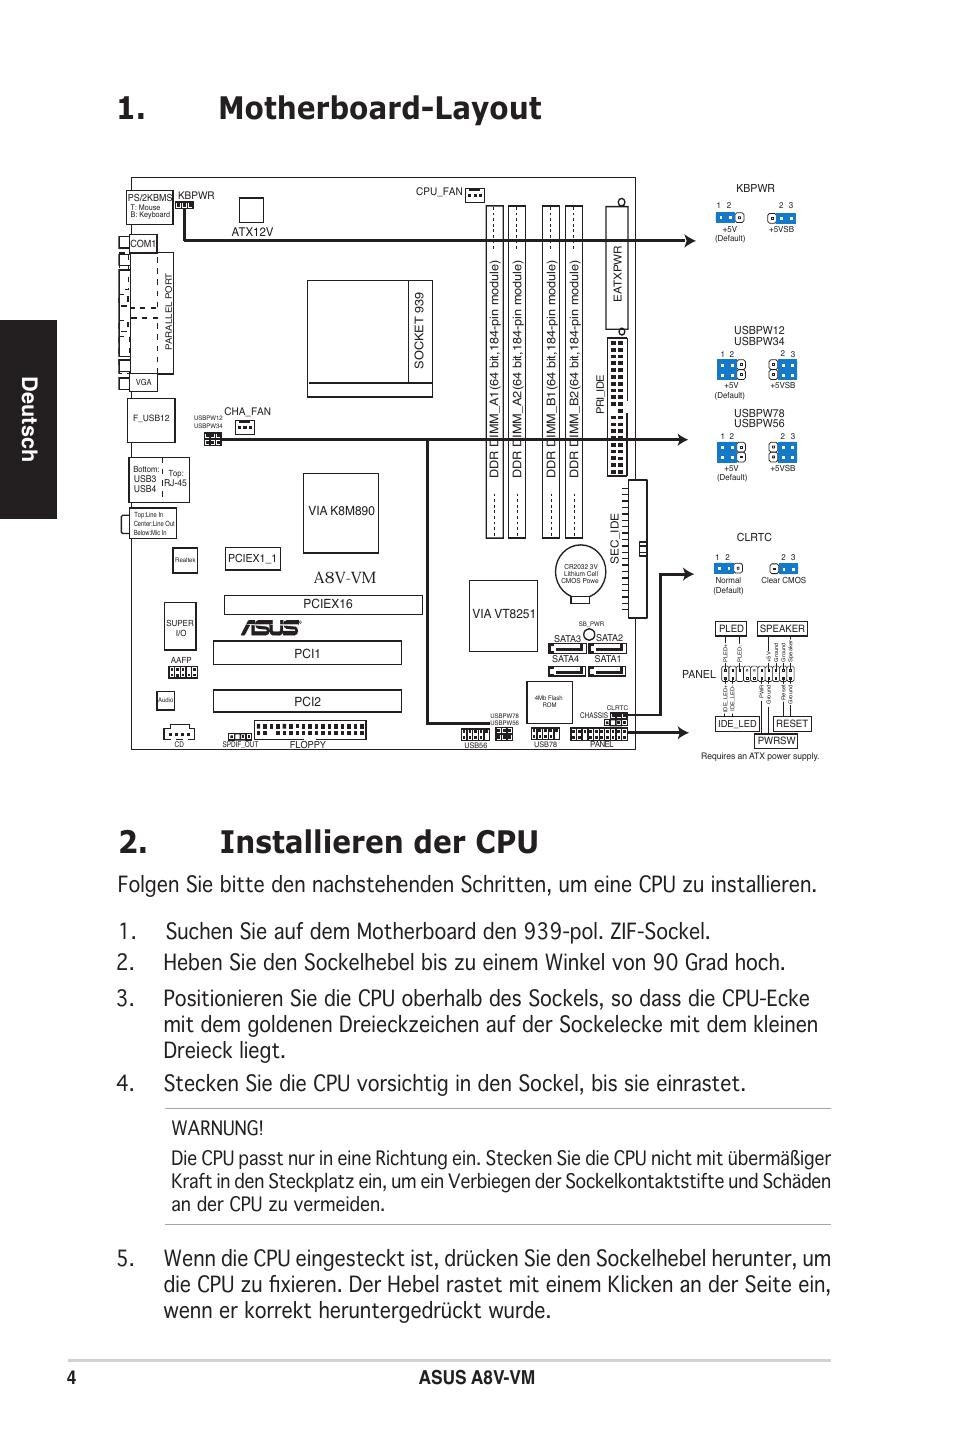 asus a8v vm manual browse manual guides u2022 rh trufflefries co asus a8v-vm manual pdf asus a8v-vm drivers